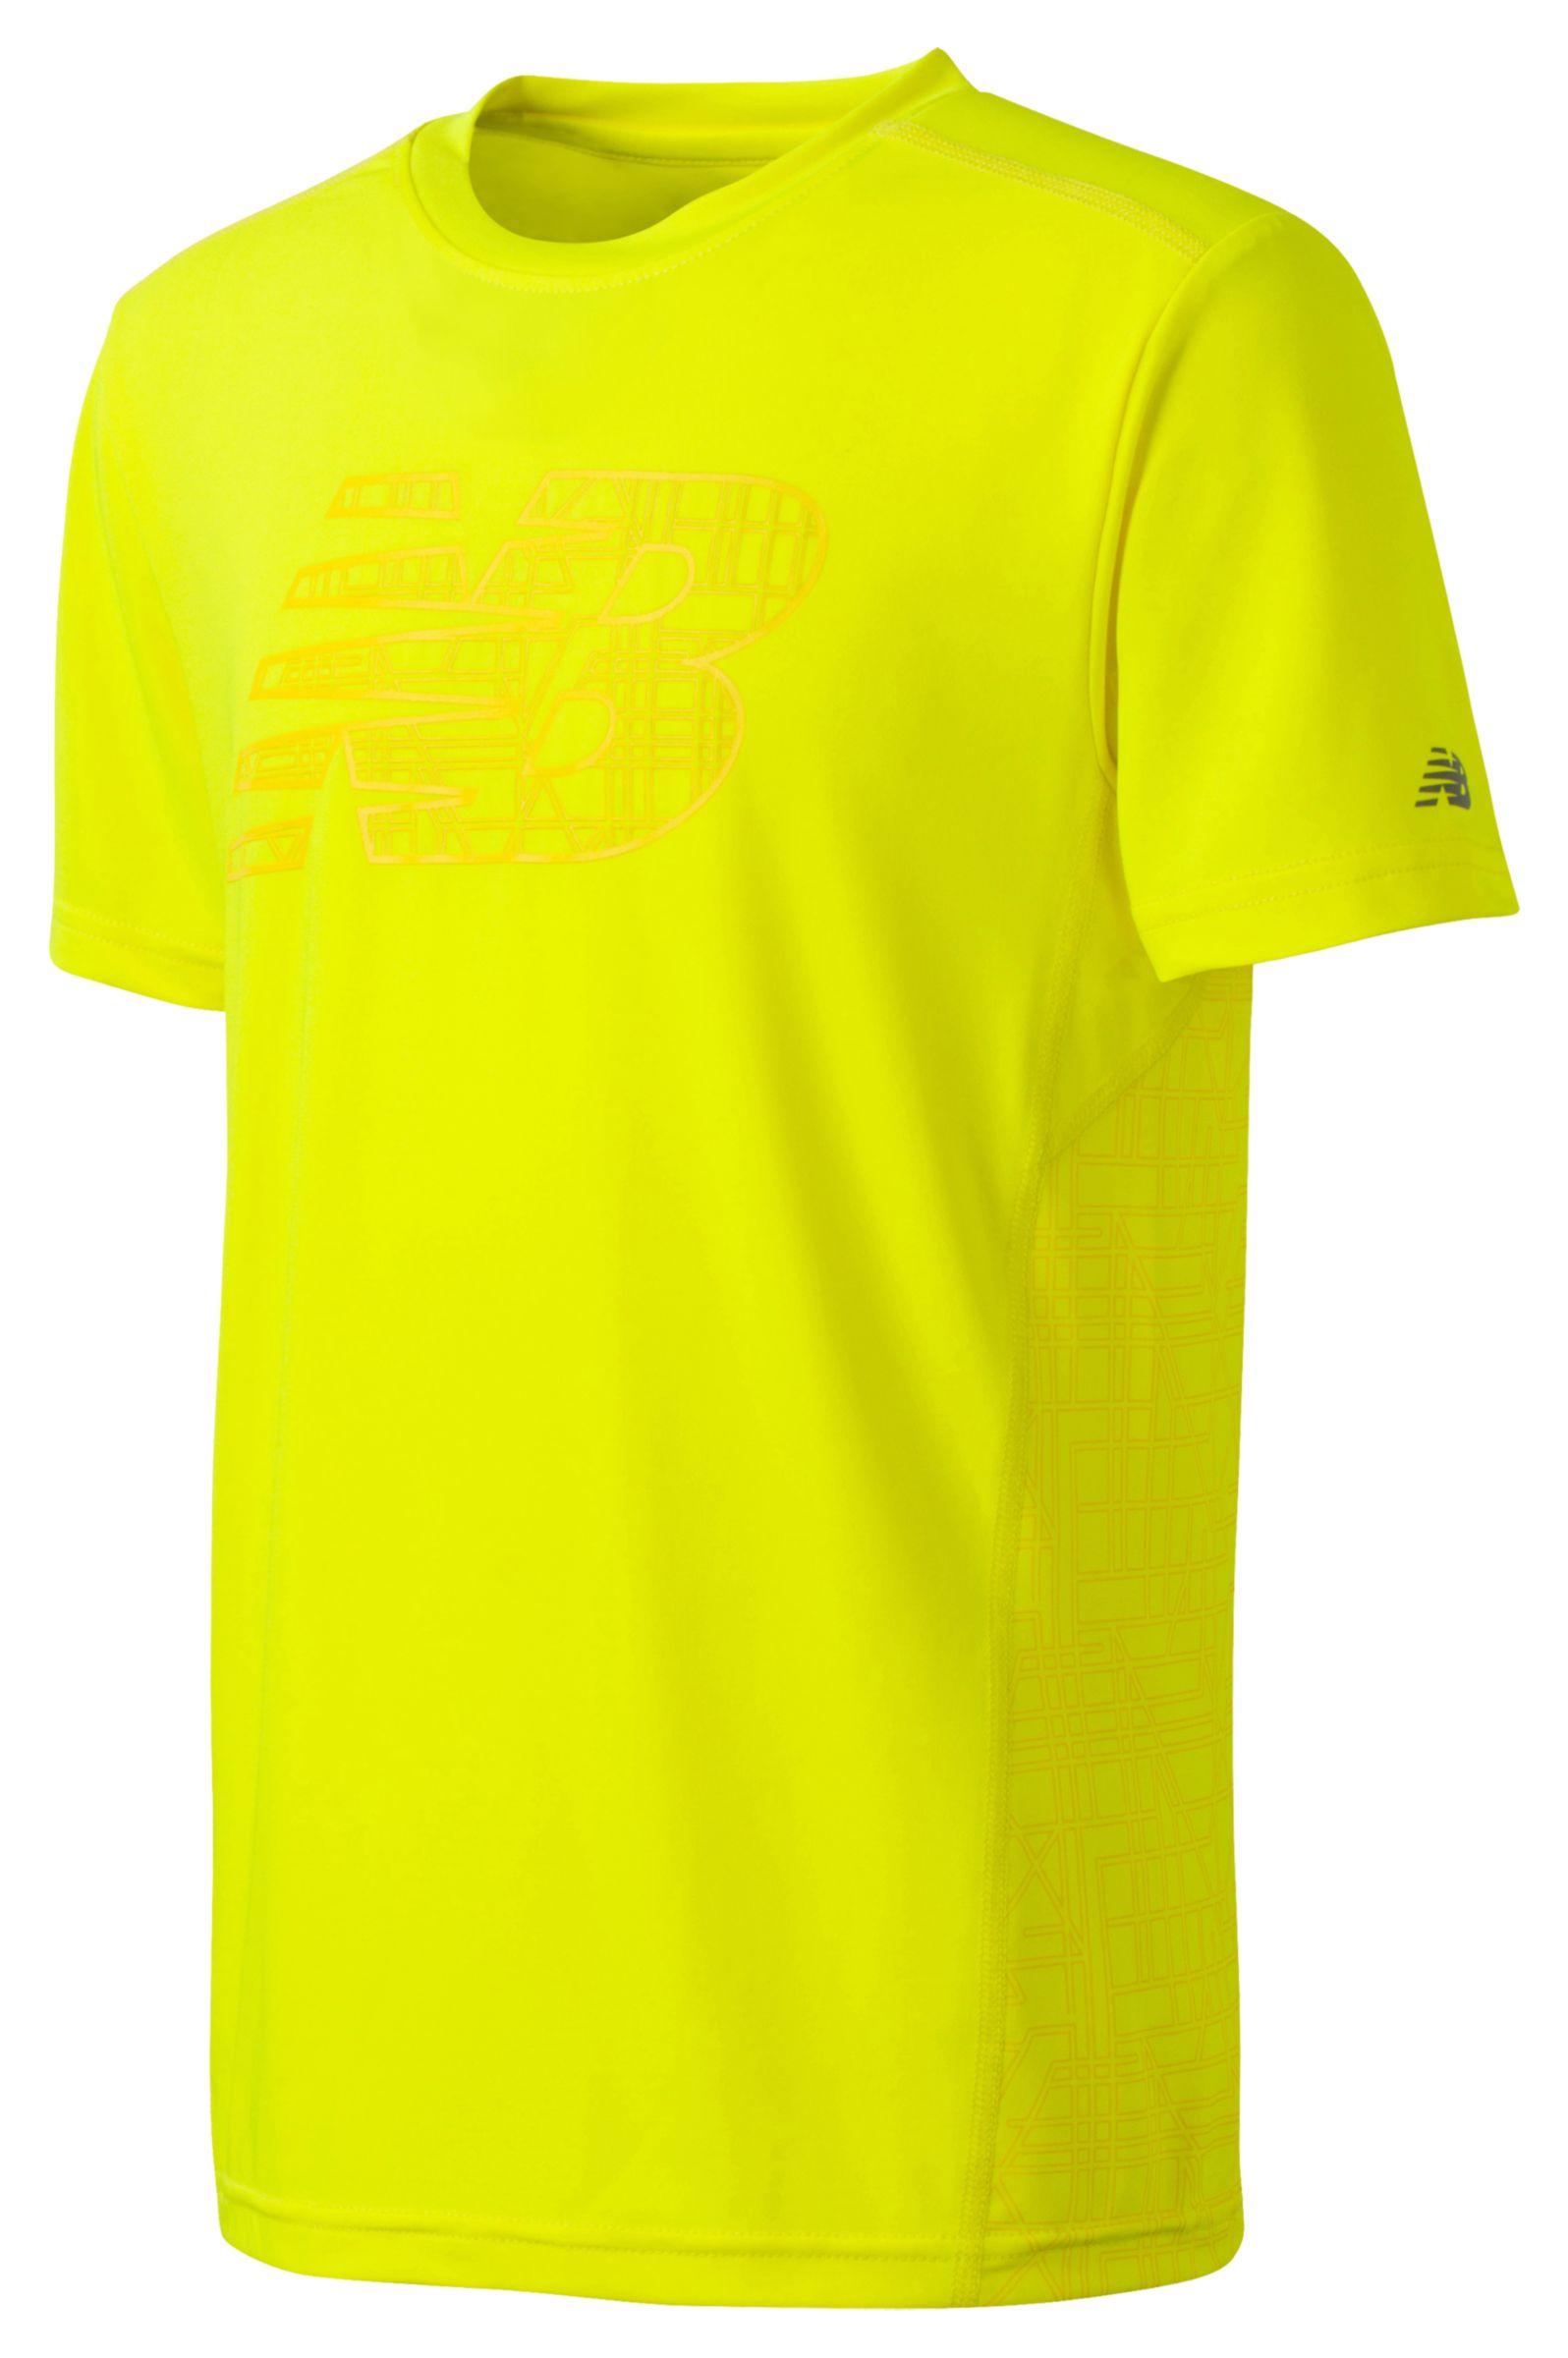 New Balance Boys Short Sleeve Printed Performance Tee Yellow